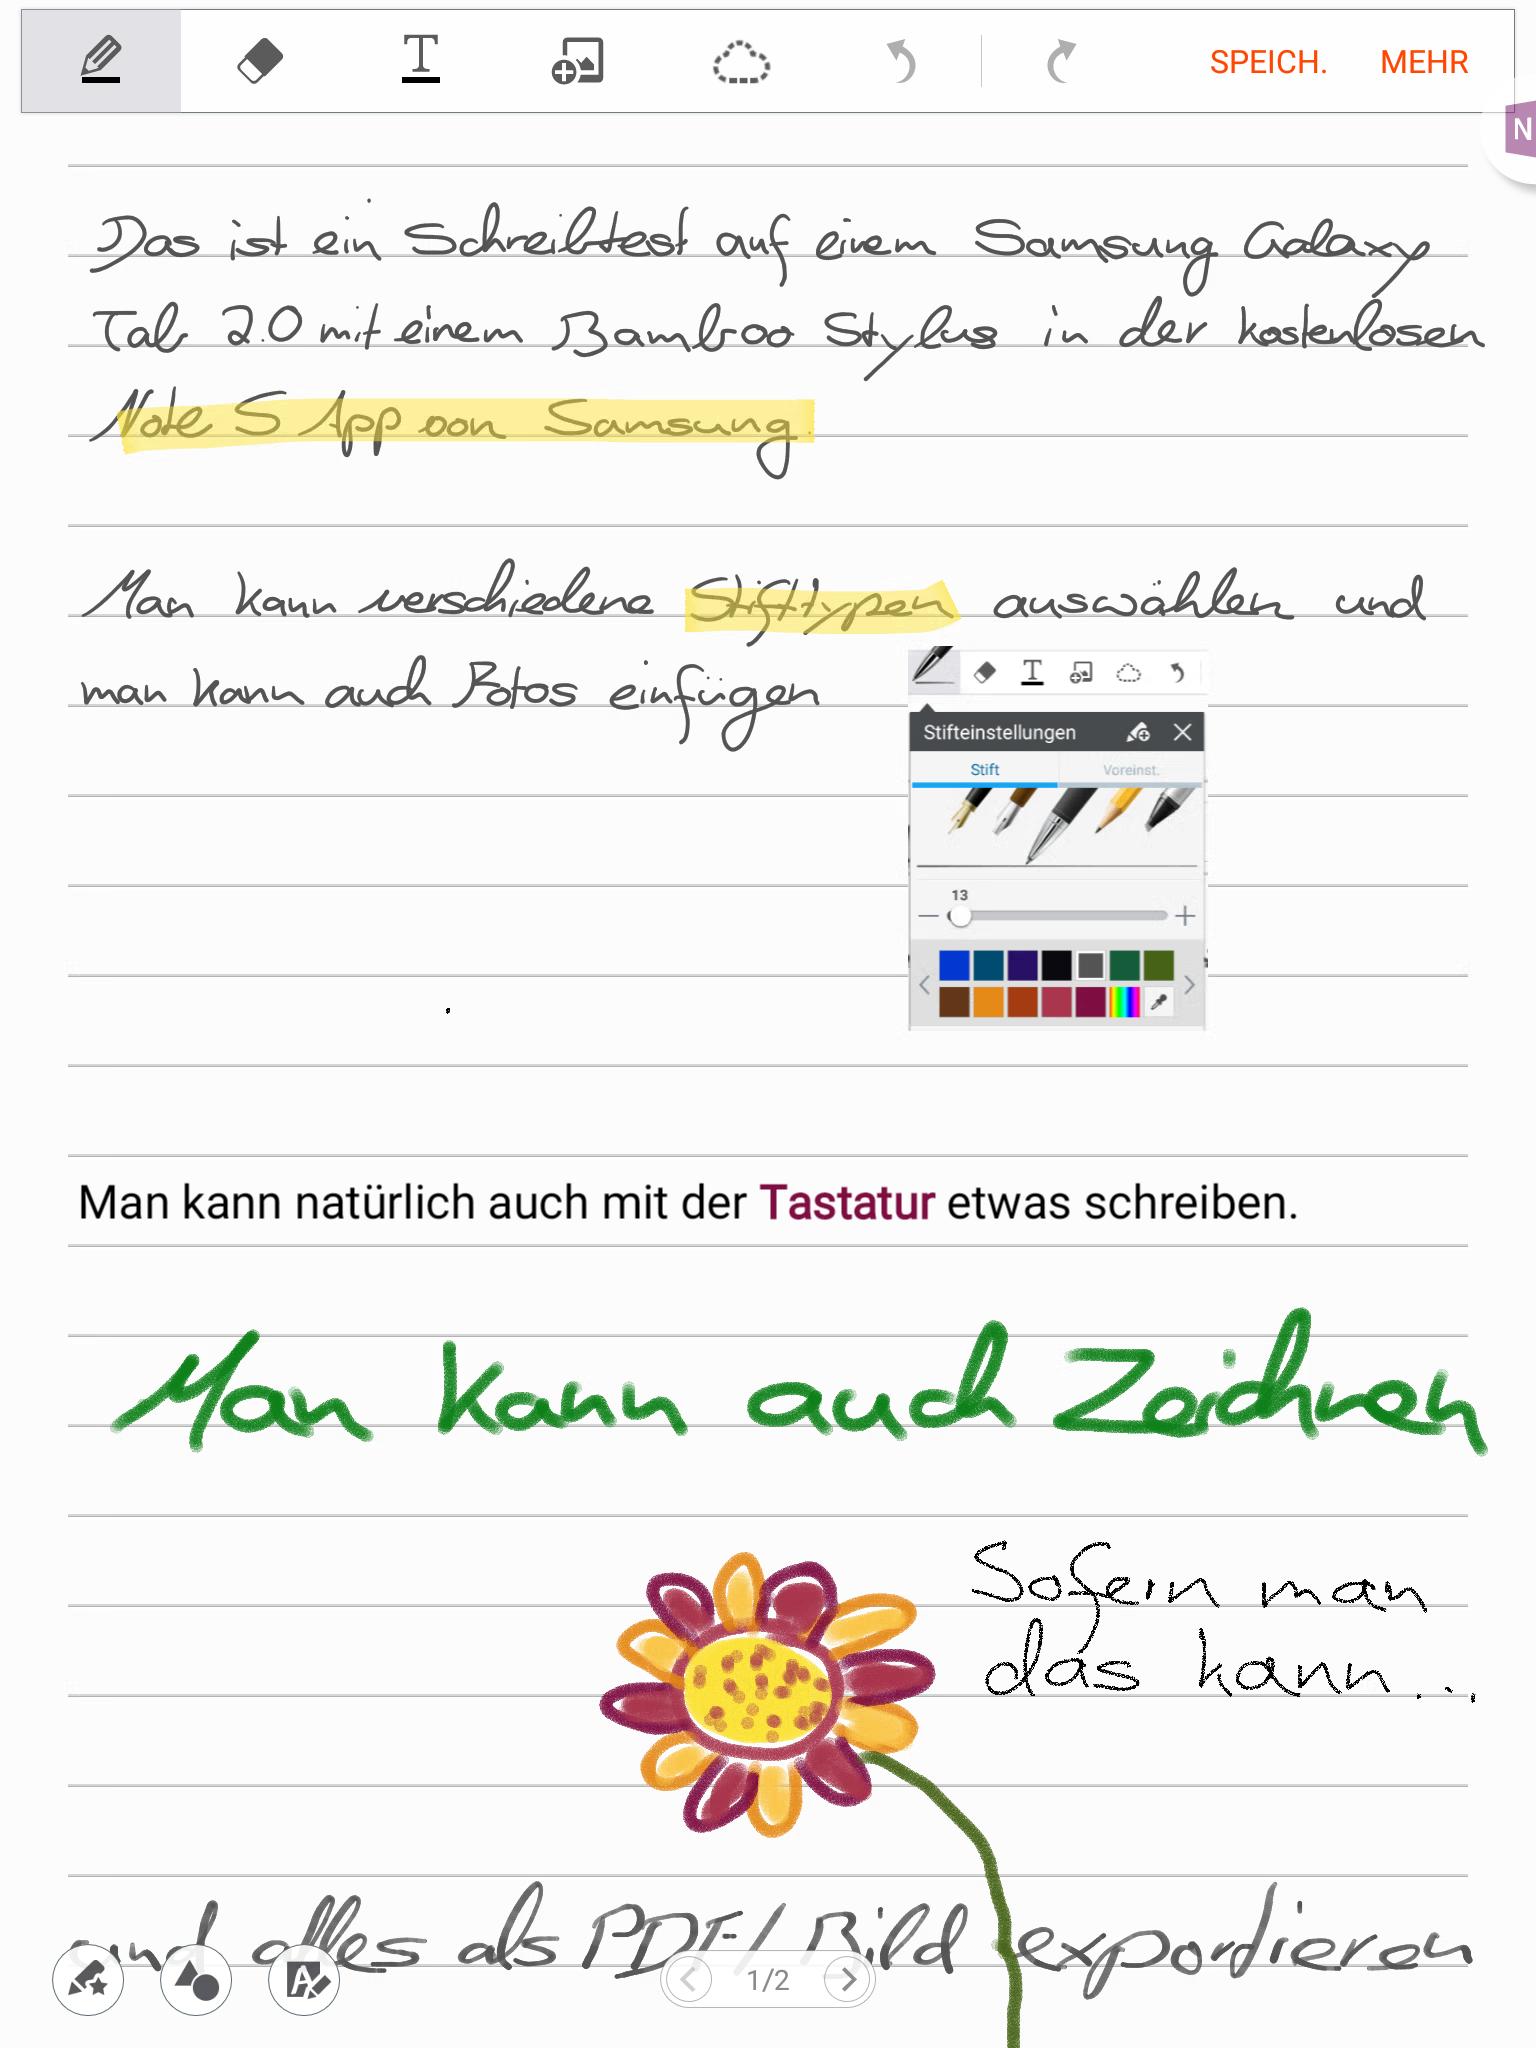 Note S Annotationen